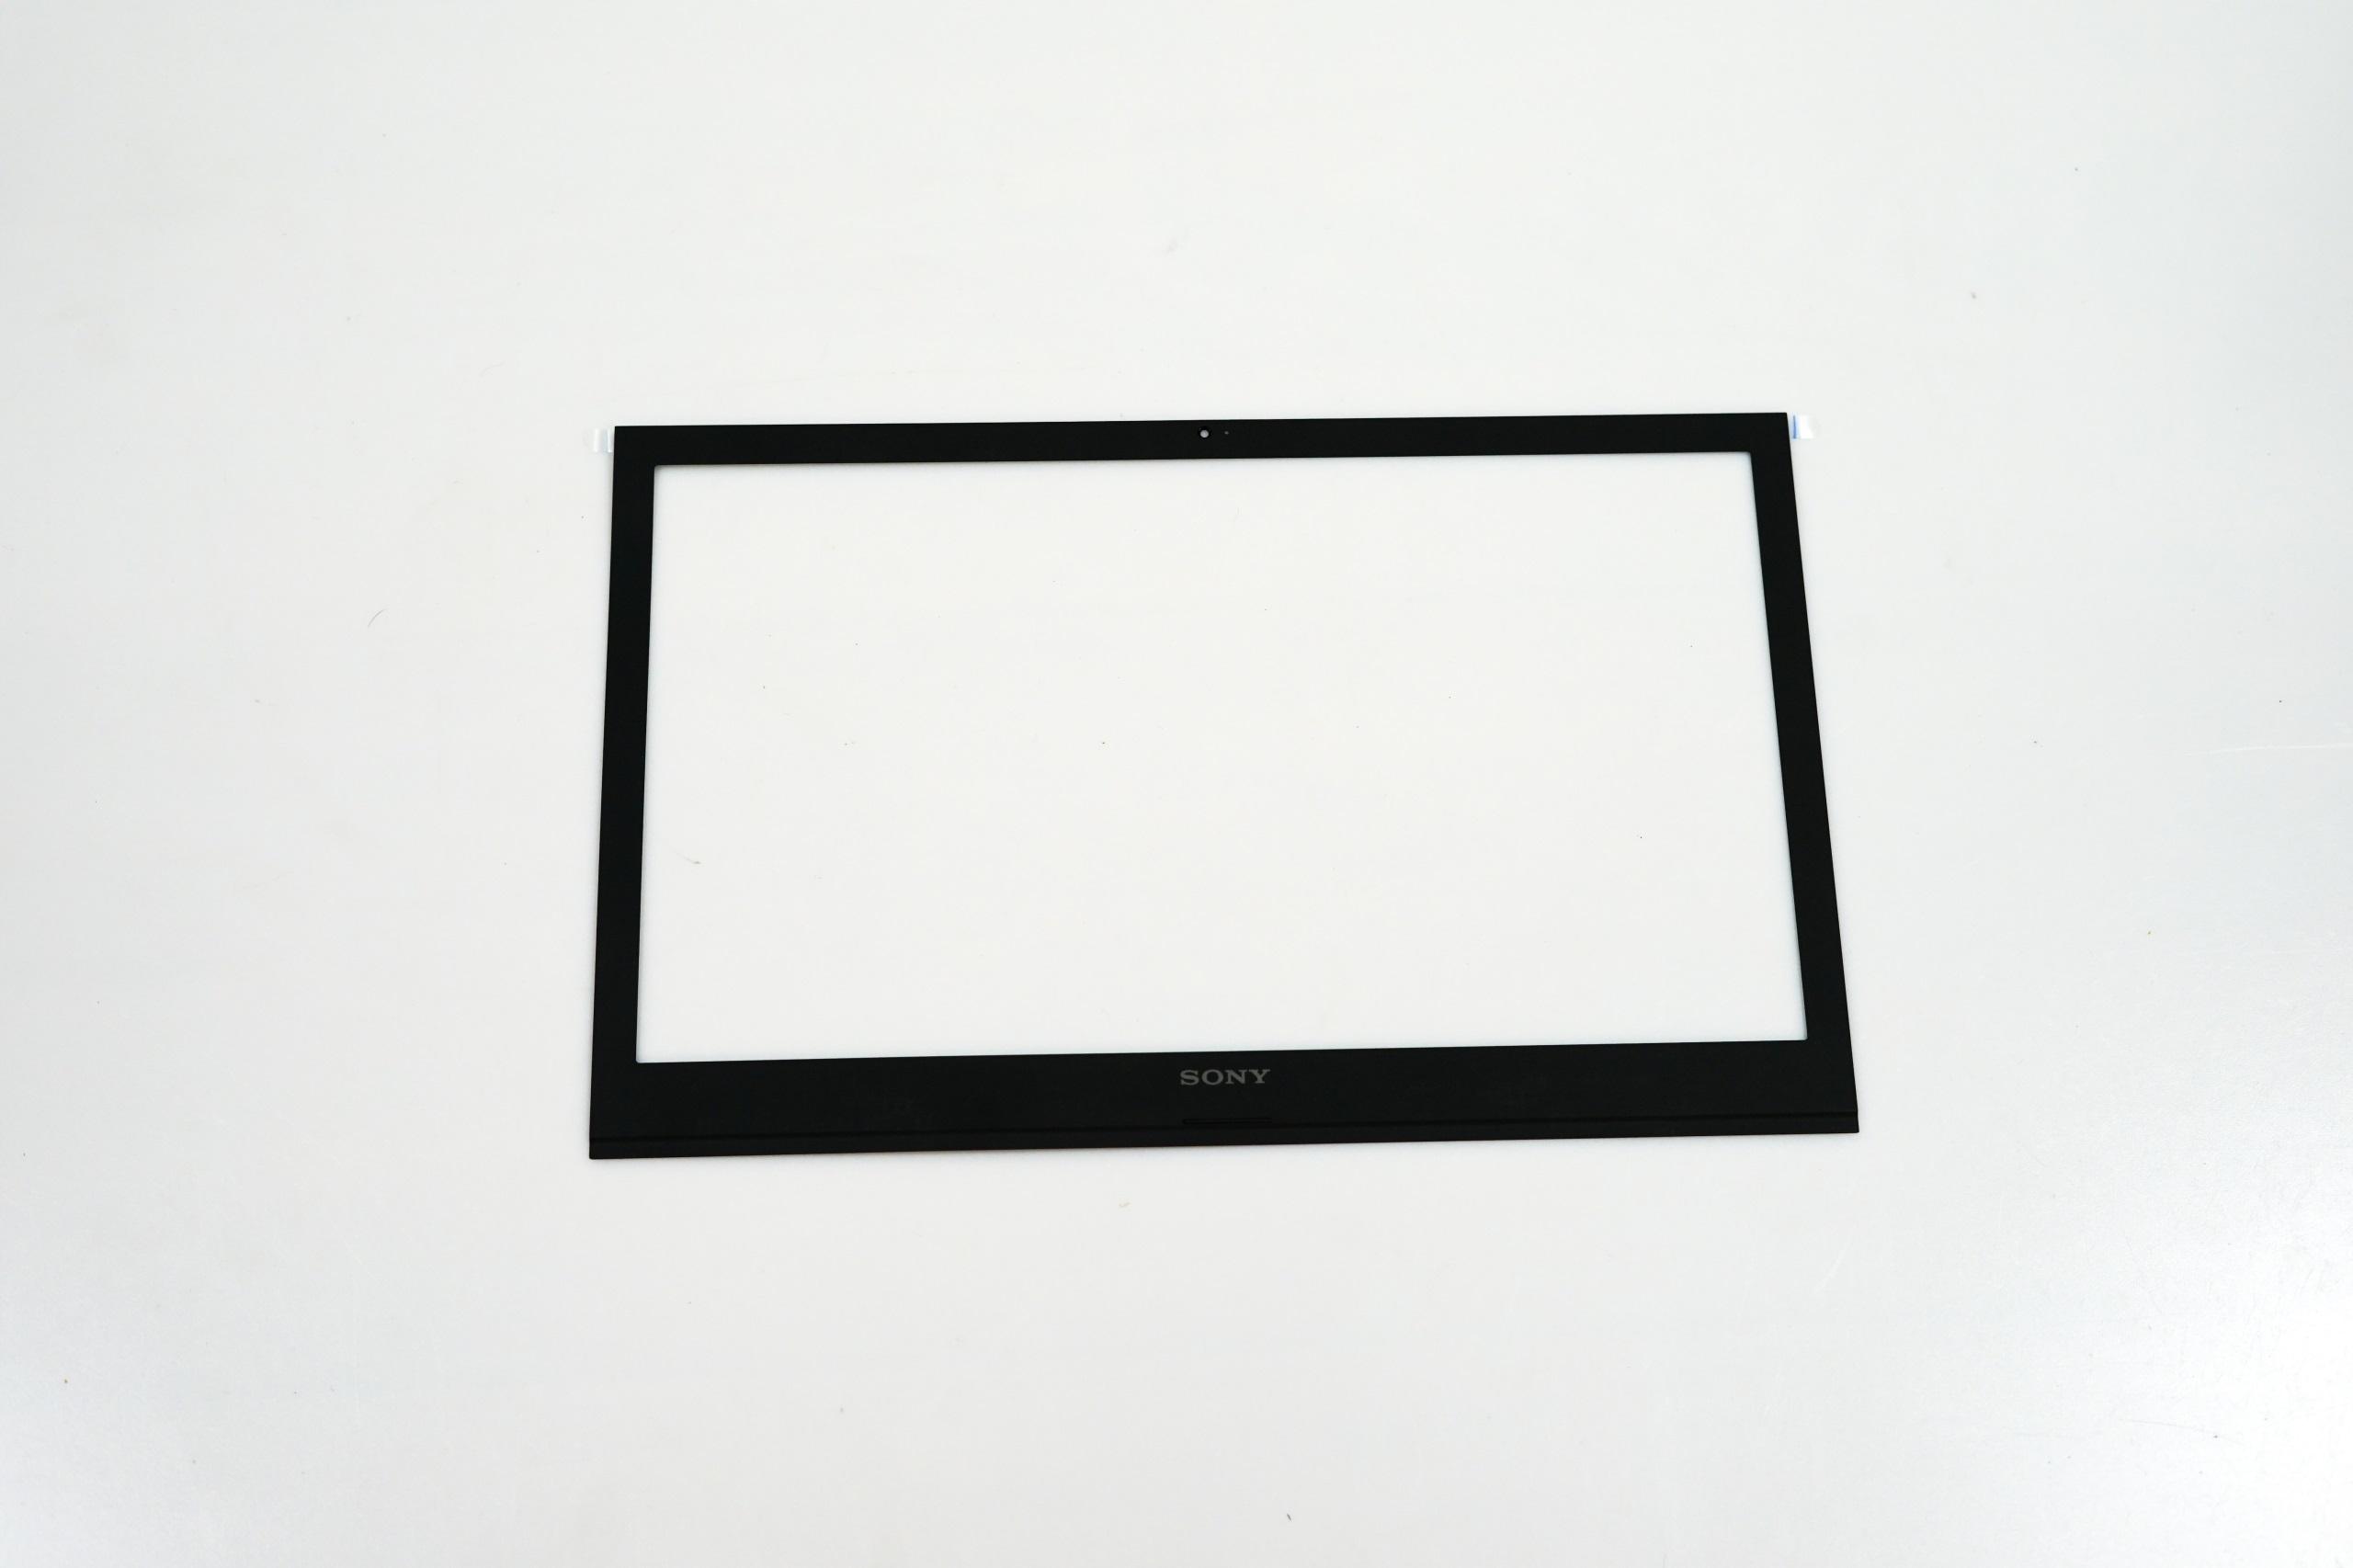 Рамка для экрана SONY VAIO PRO 13 SVP13